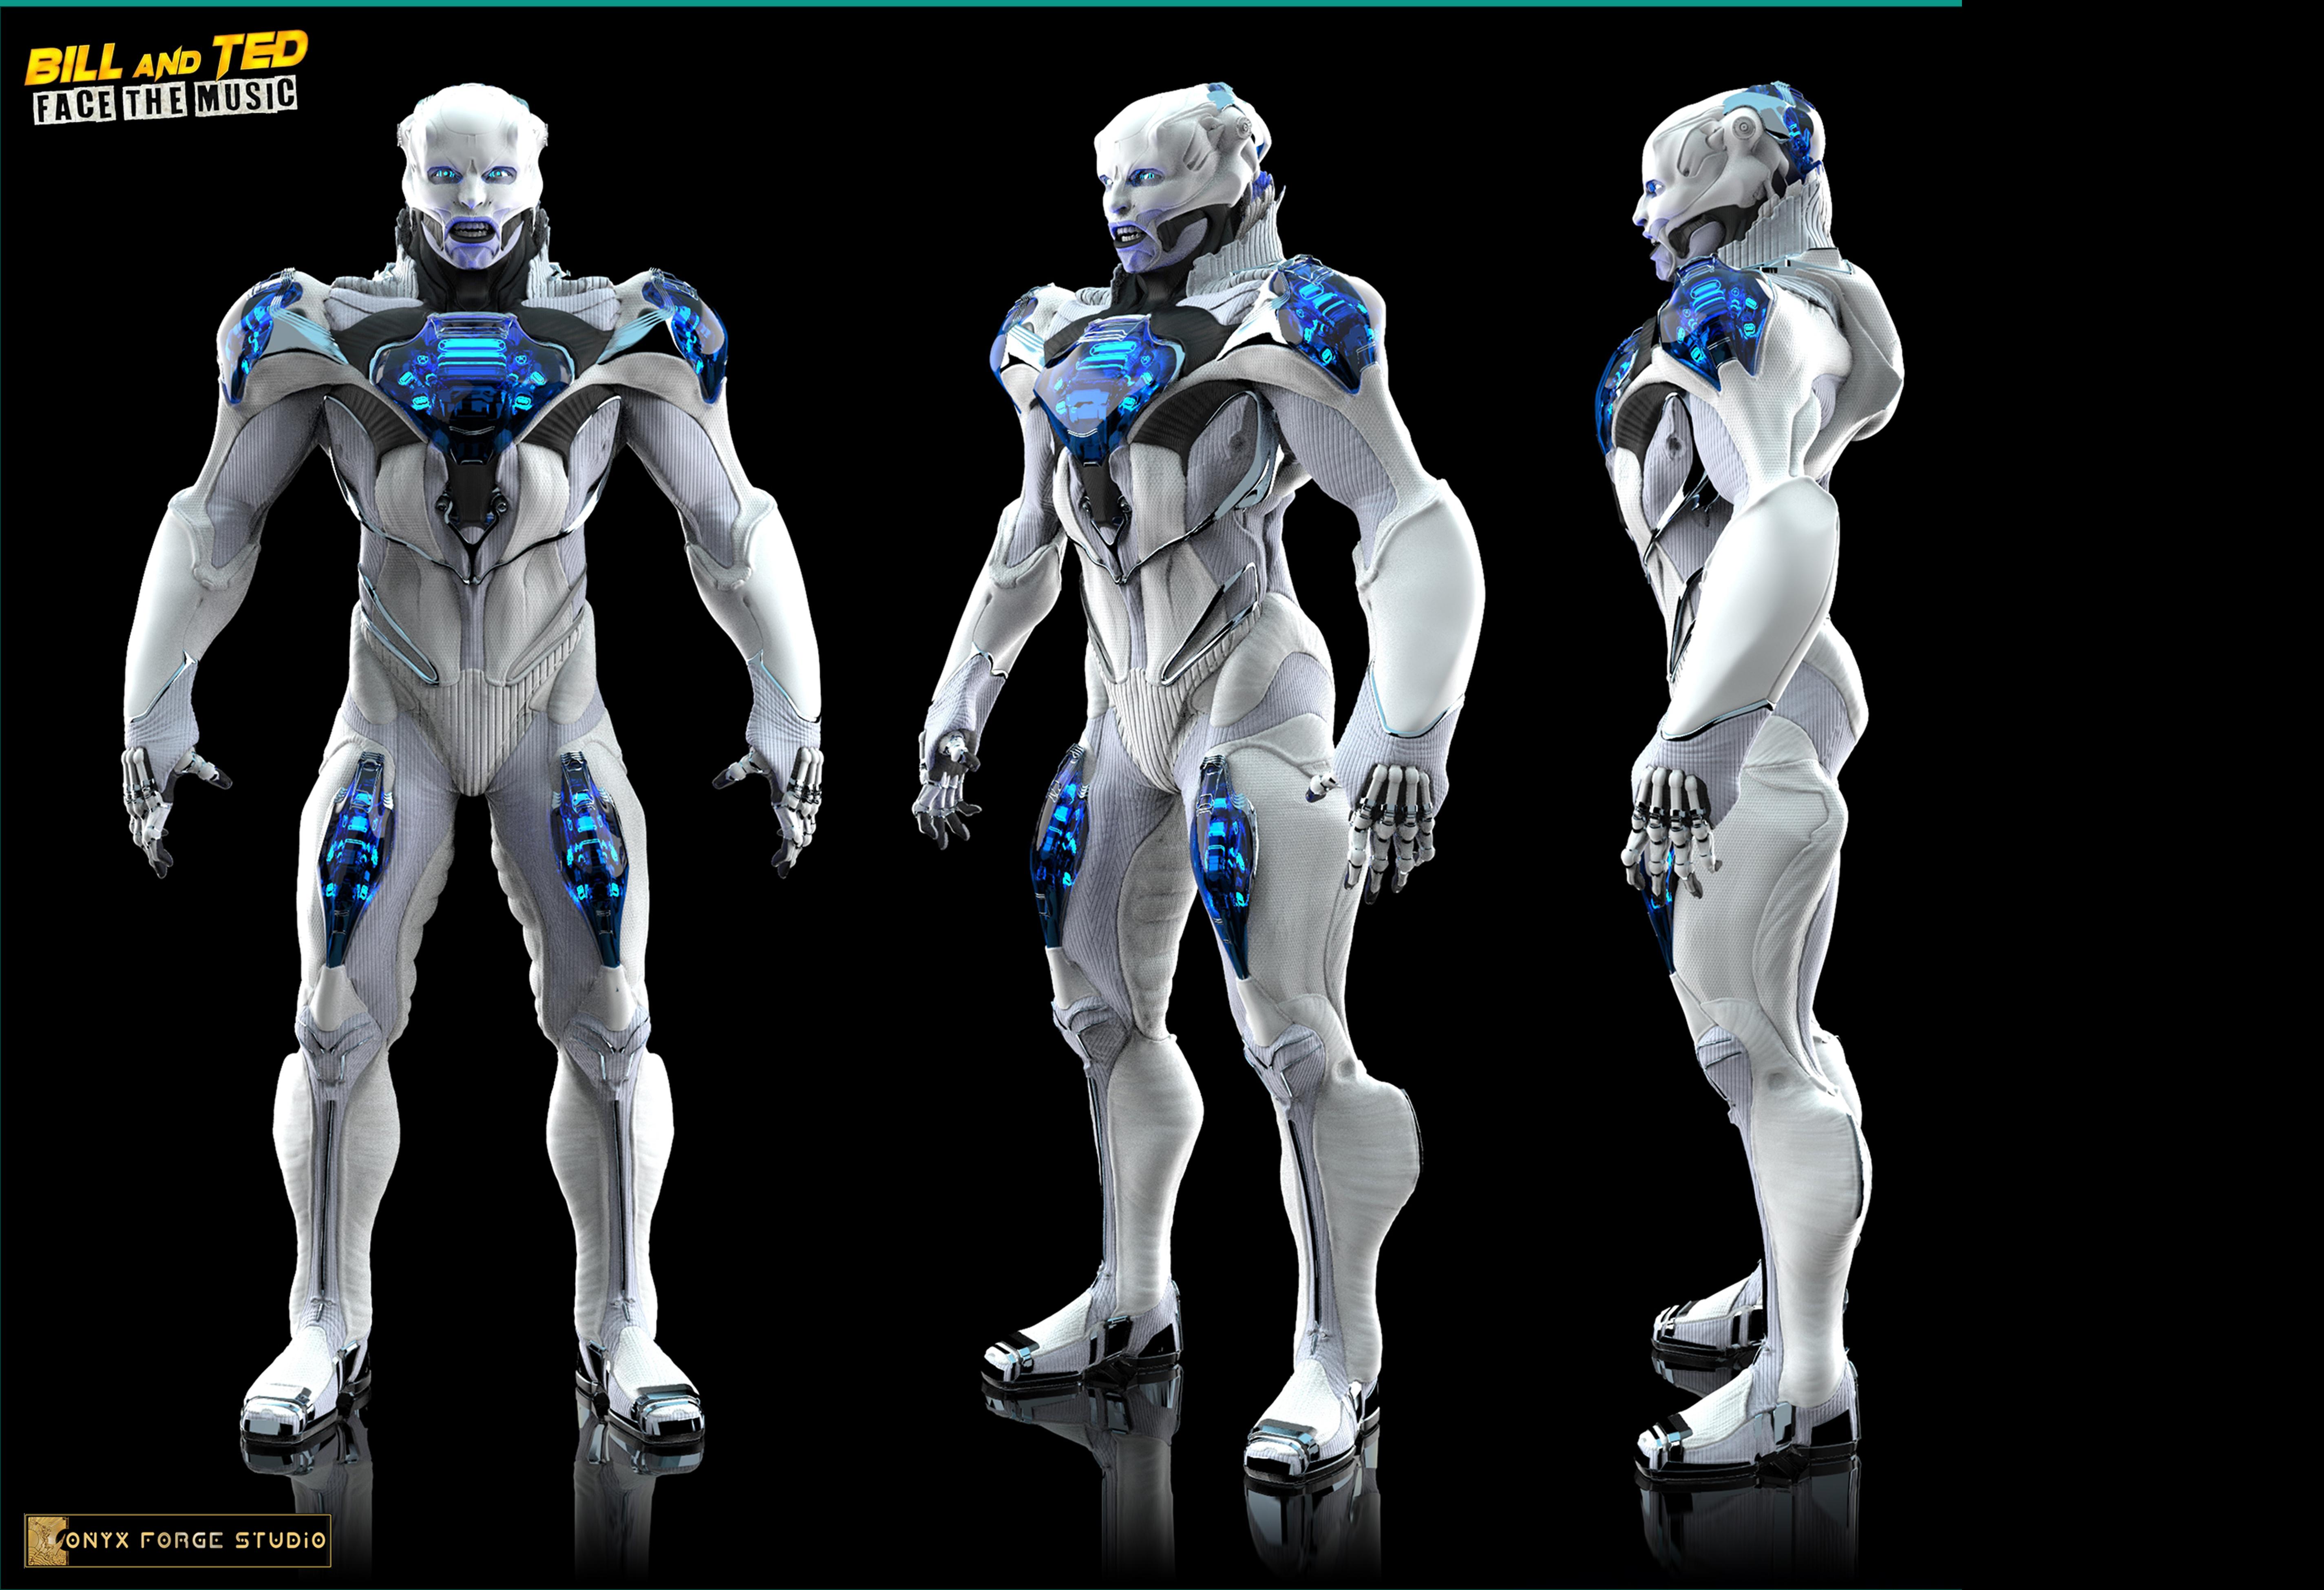 Killer_Robot_Full_TurnAround_01A